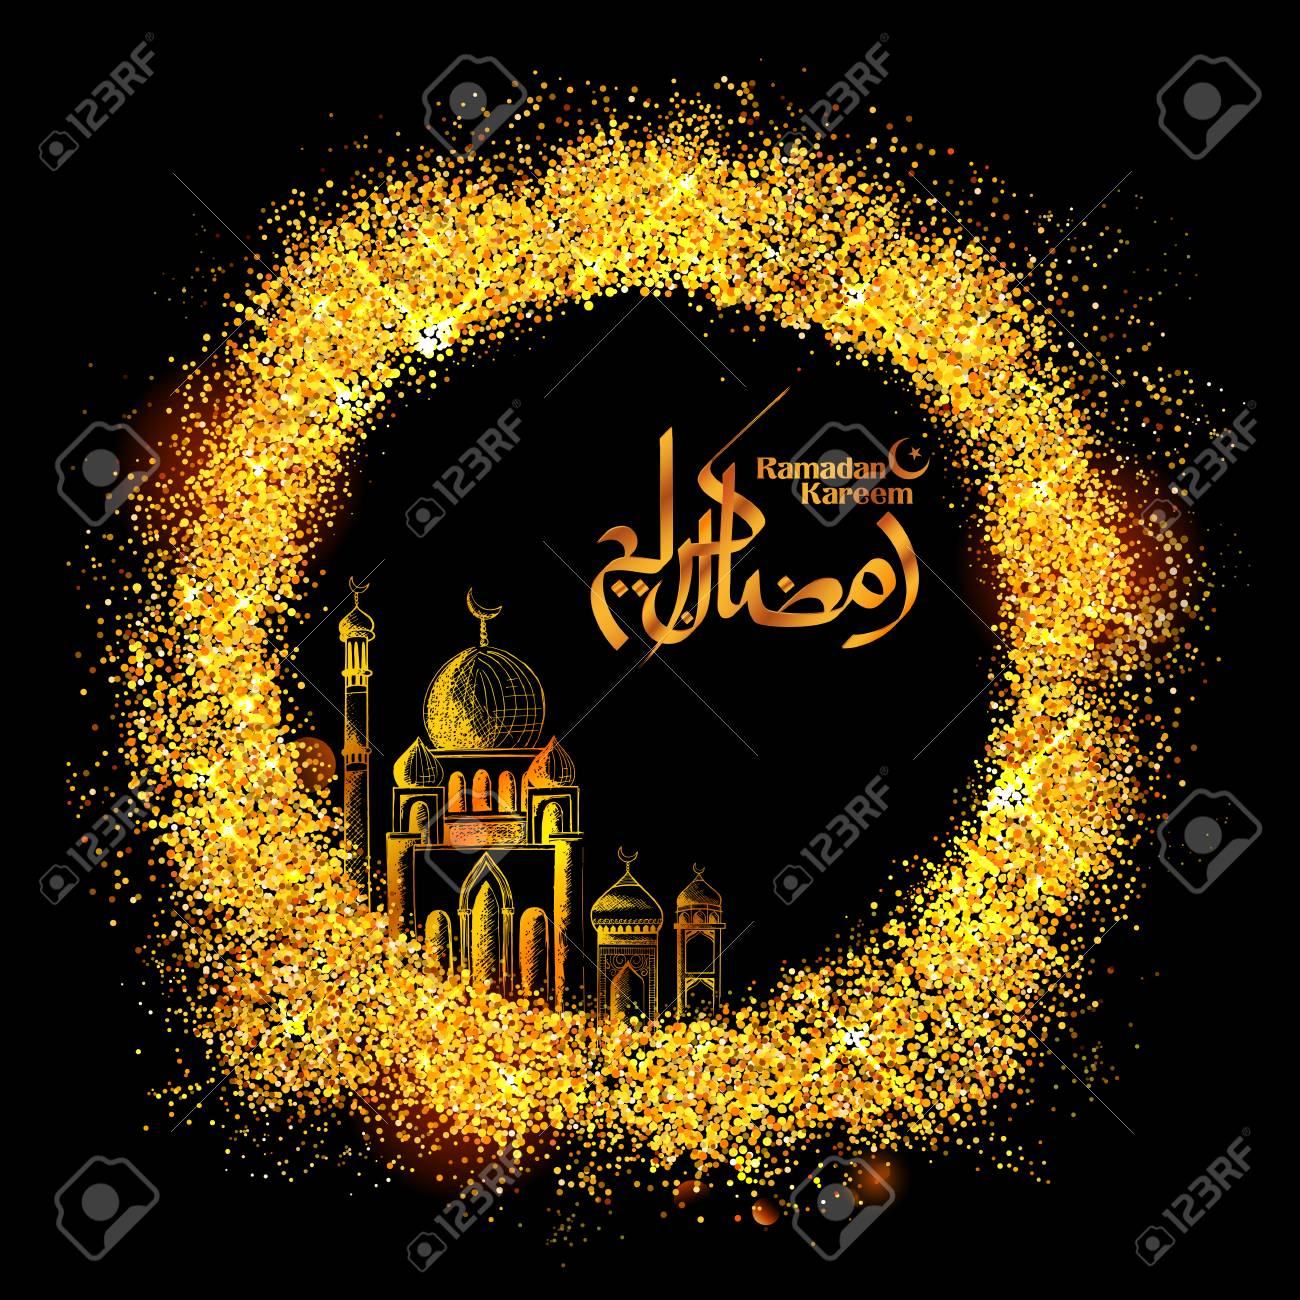 Ramadan kareem generous ramadan greetings in arabic freehand stock ramadan kareem generous ramadan greetings in arabic freehand with mosque stock photo 80109706 m4hsunfo